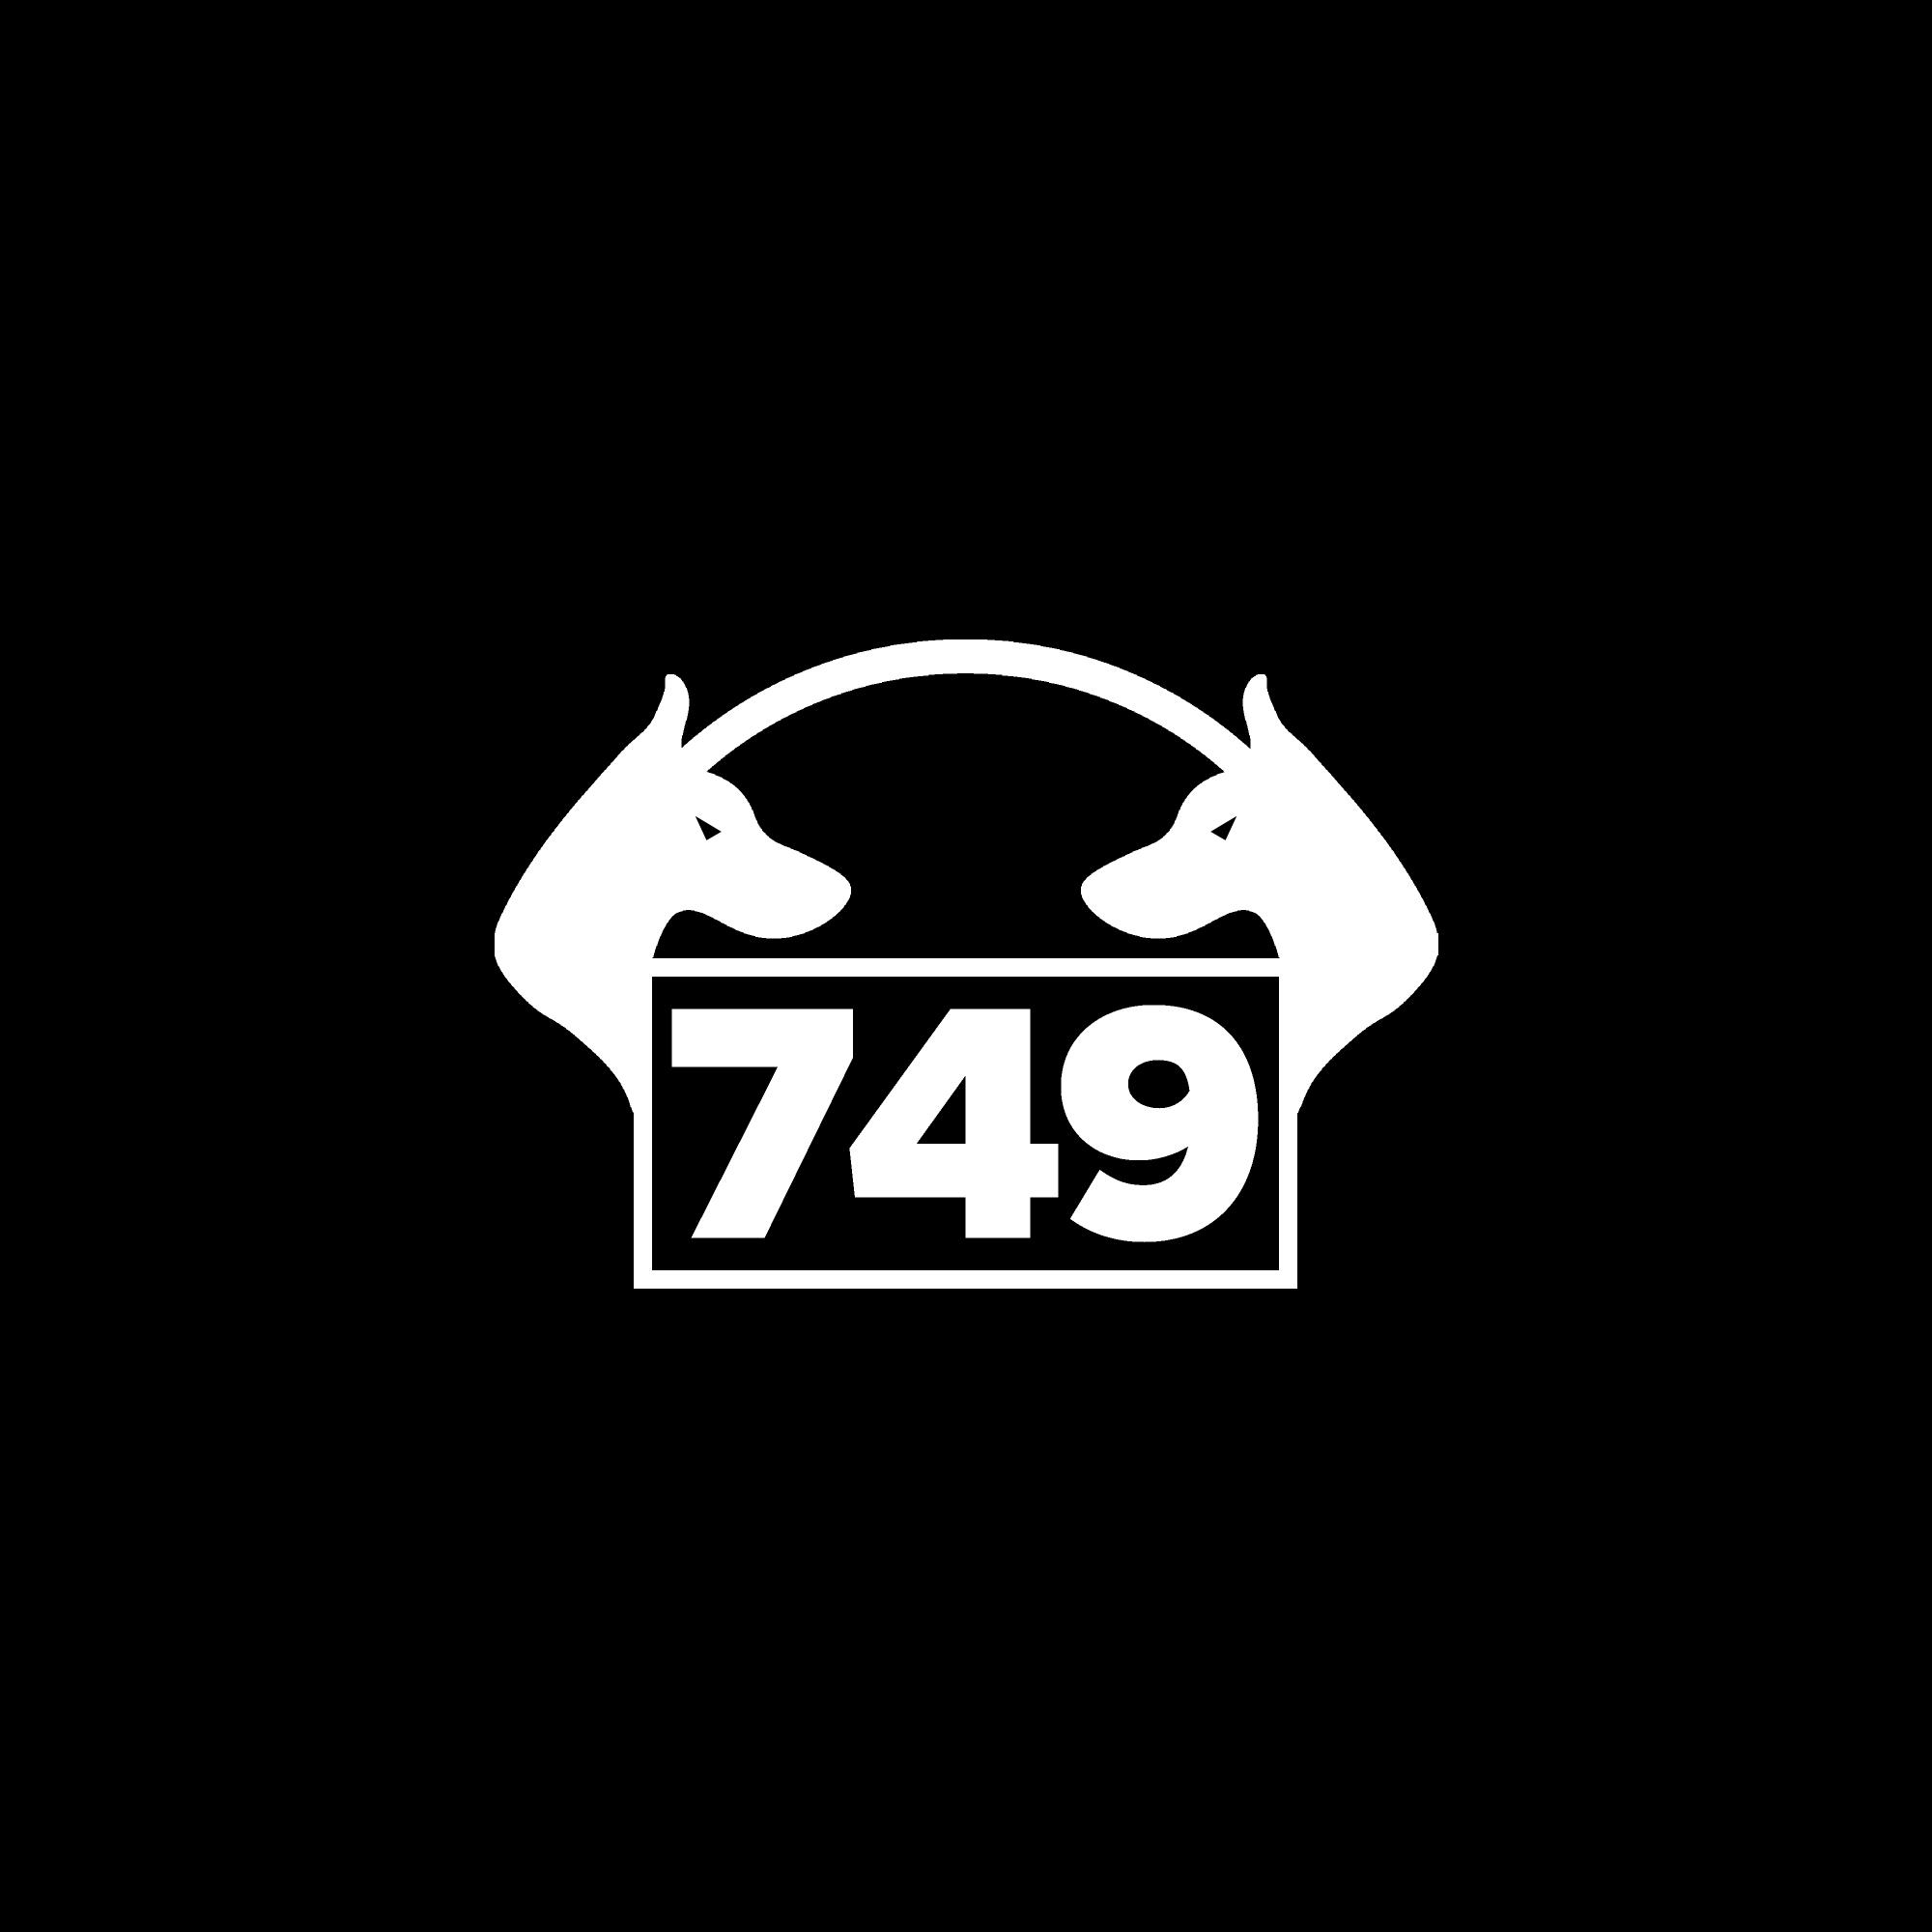 749 Music